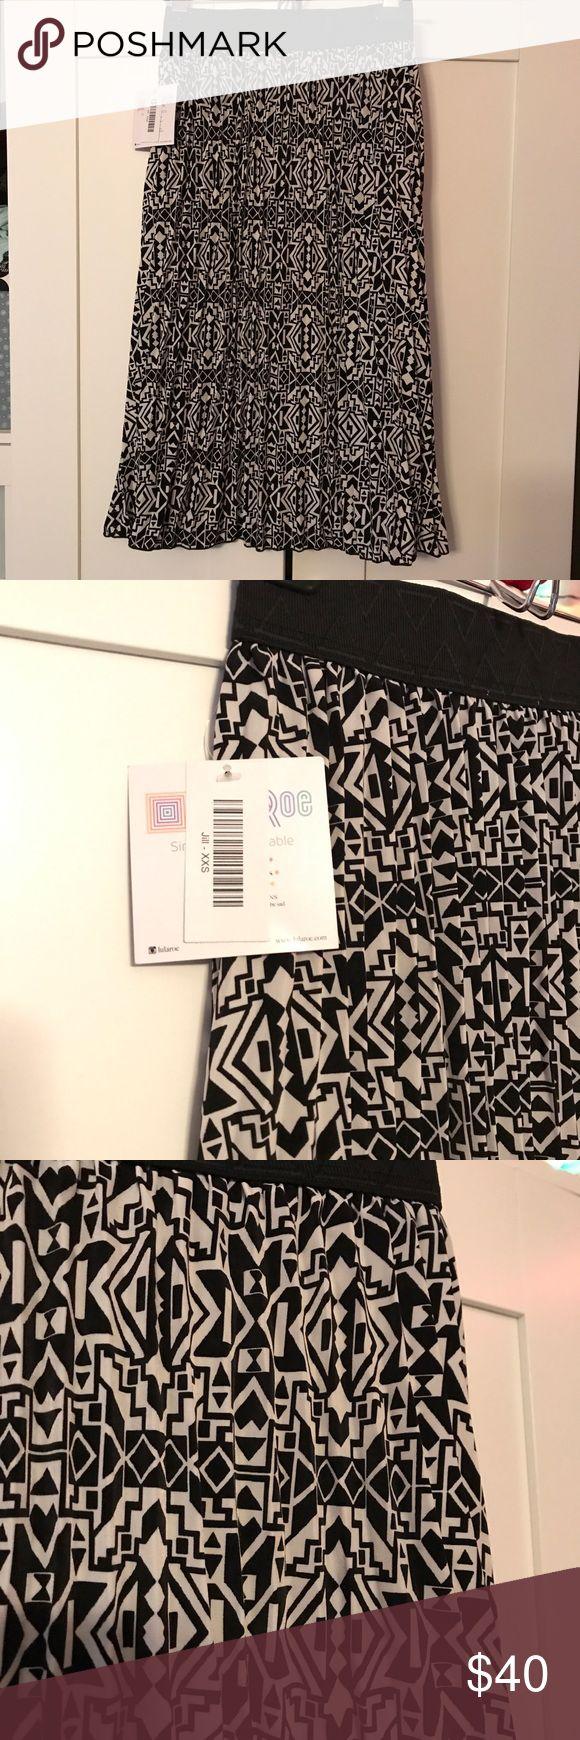 BNWT Lularoe Jill Skirt XXS Lularoe Jill Skirt... I love this skirt so much, it's just too small for me :( LuLaRoe Skirts Midi